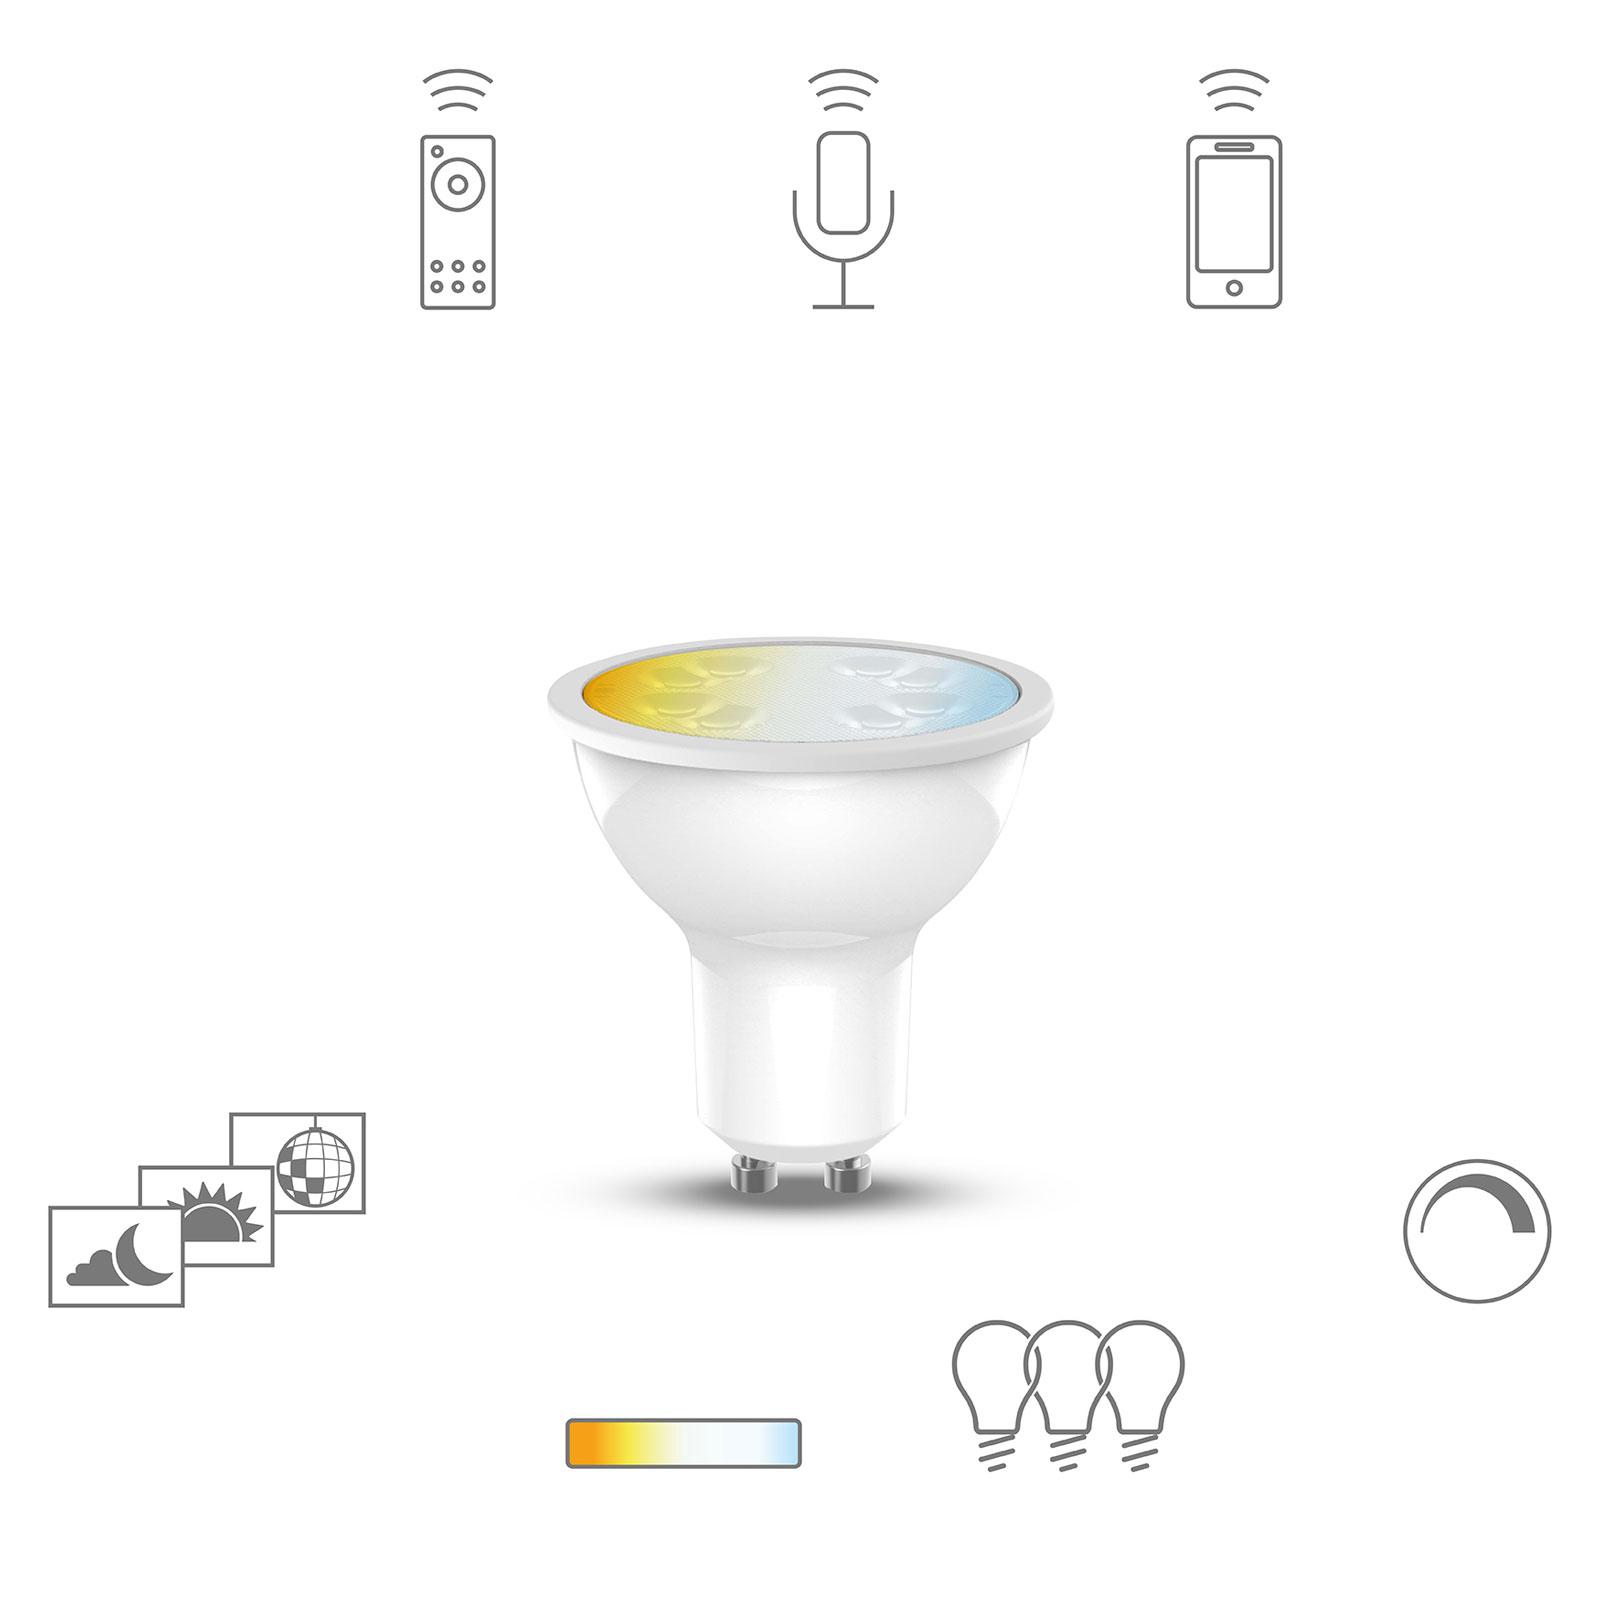 Müller Licht tint white reflektor LED GU10 5W CCT